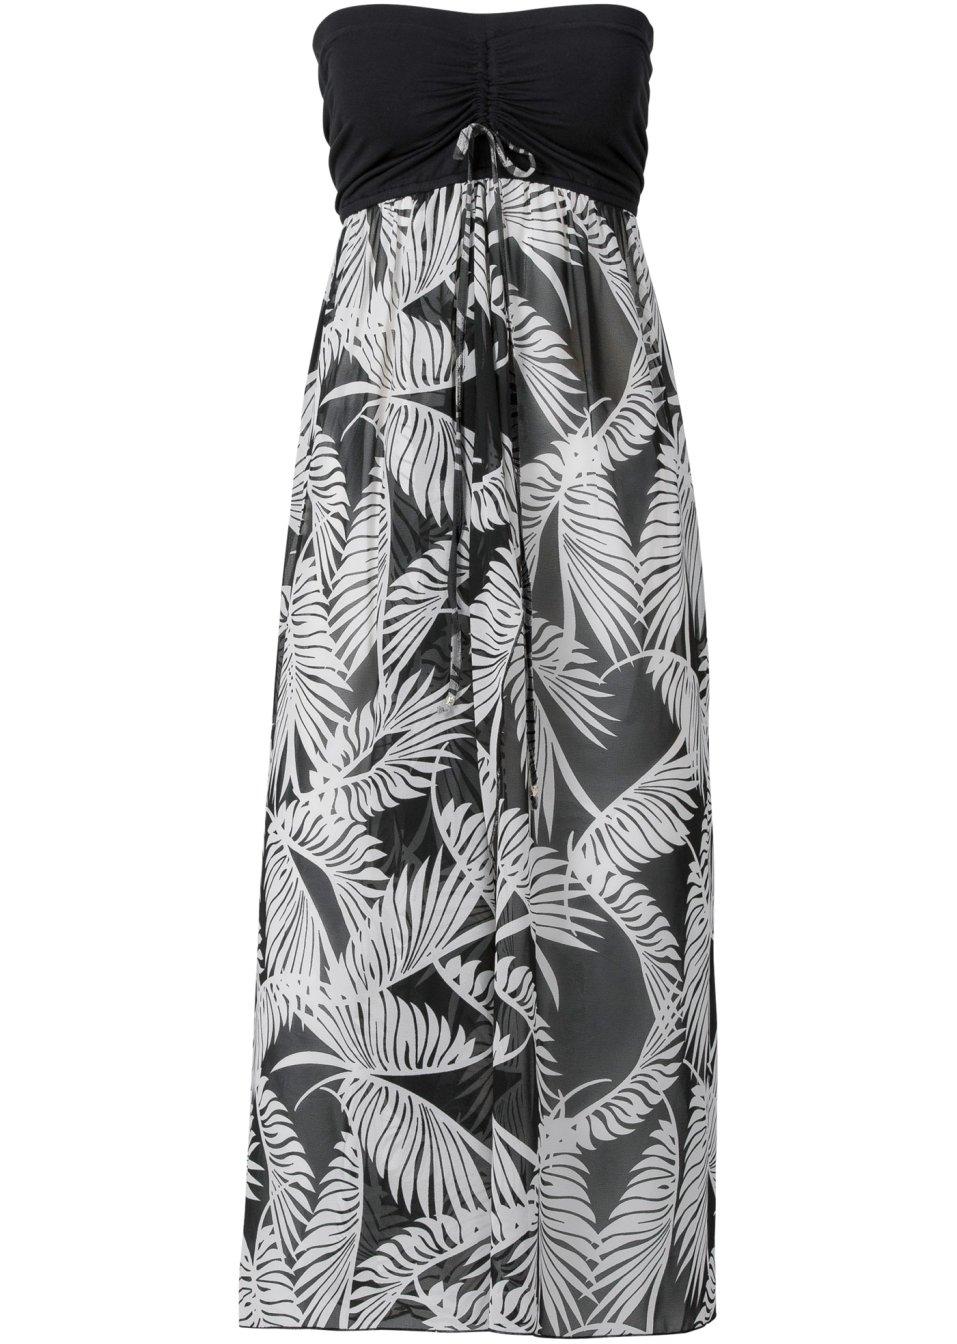 Apartes Strandkleid mit Bandeau-Top - schwarz/weiß 1U7U3 DFm9v